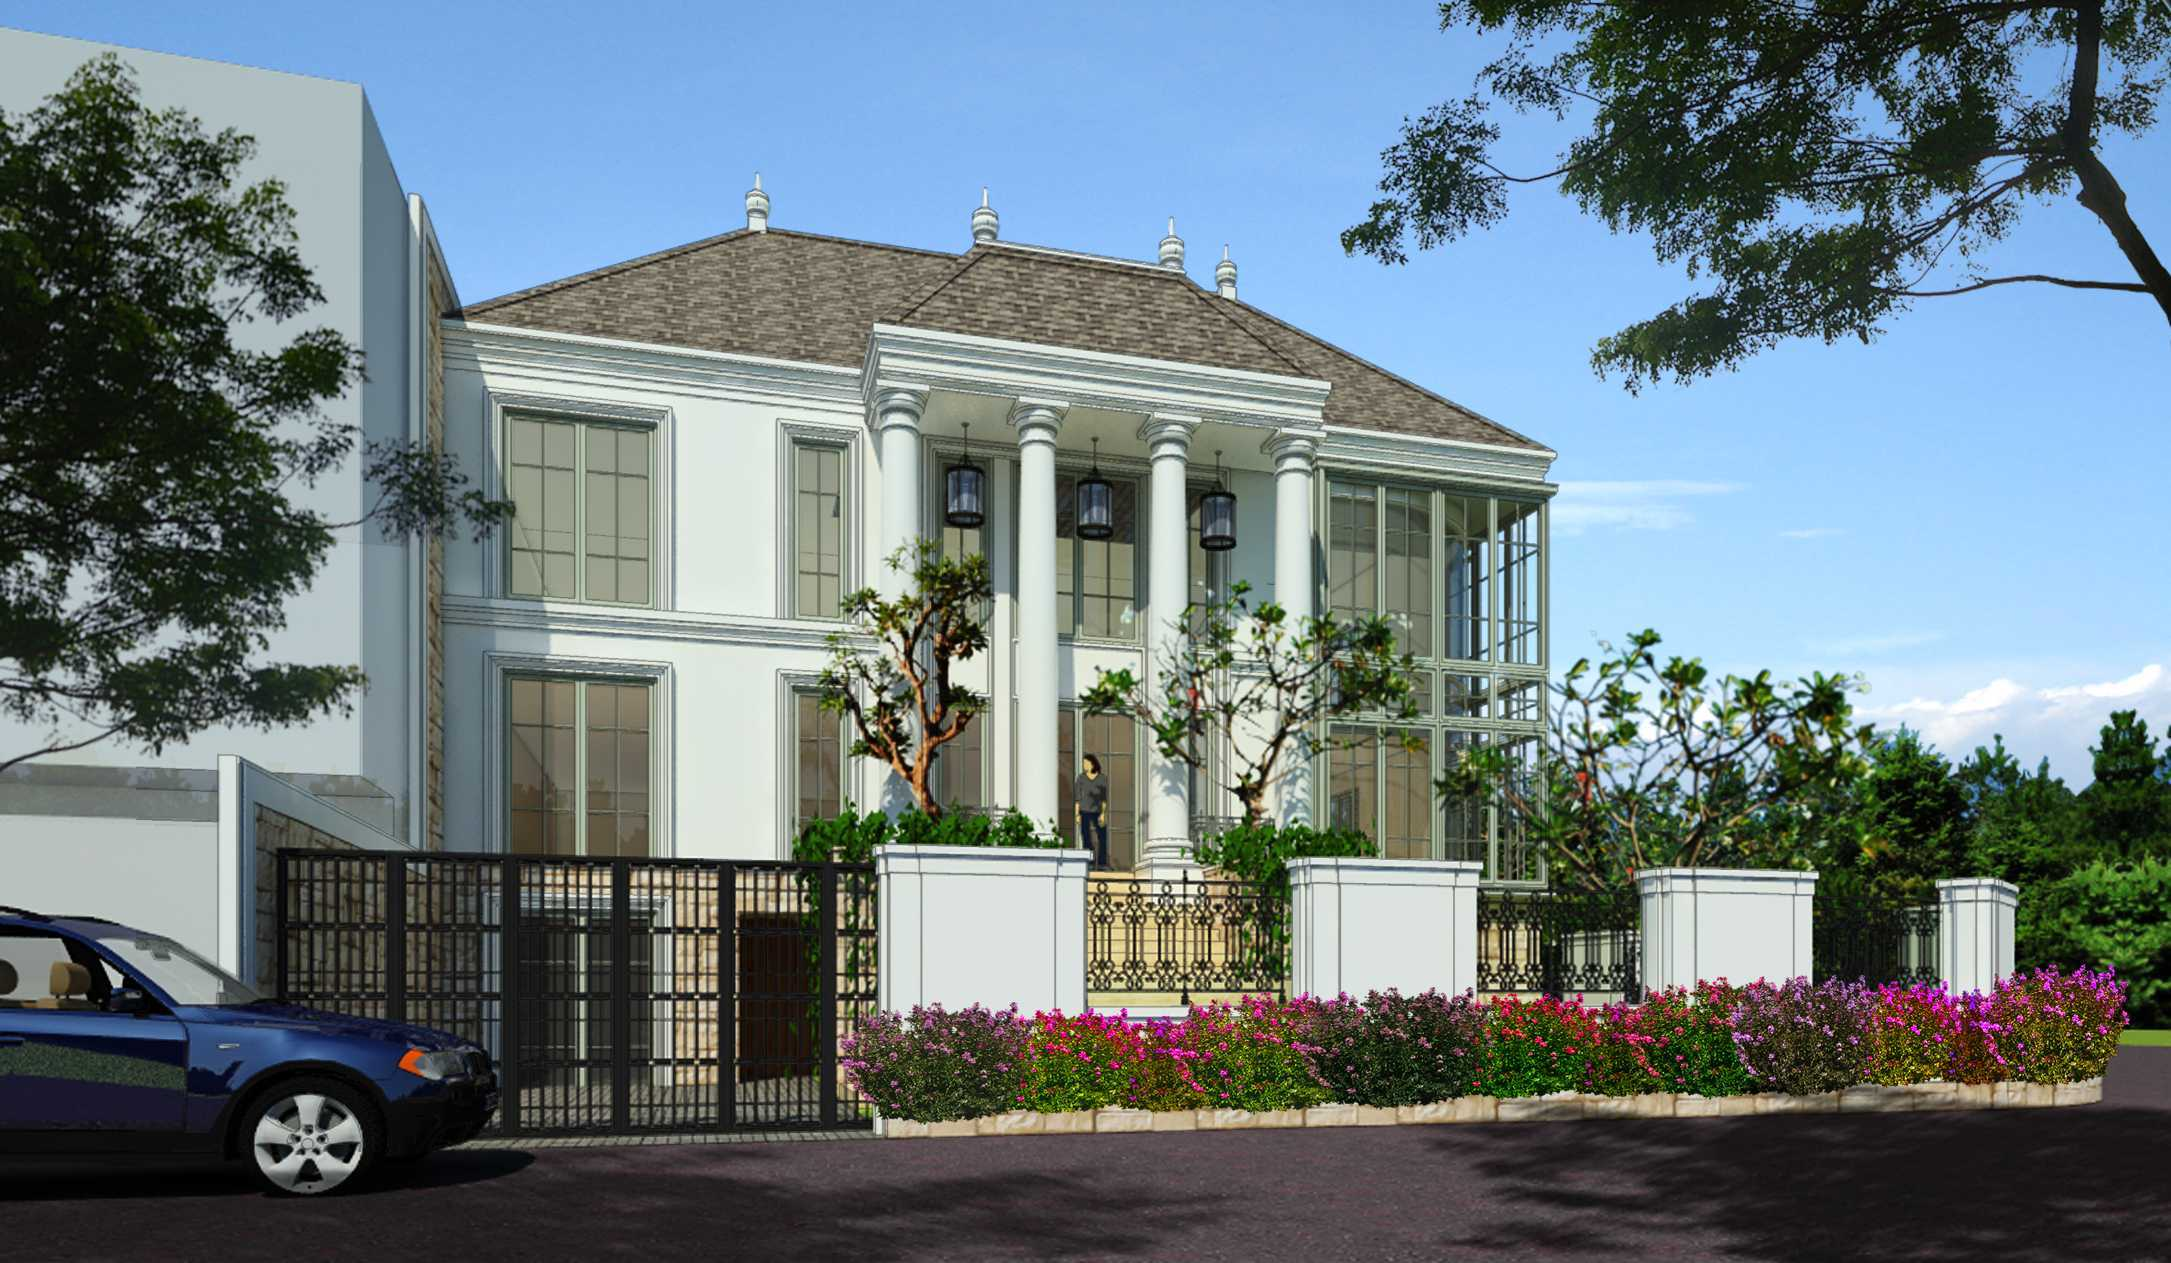 Indra Gunadi Kelapa Gading Residence Kelapa Gading, North Jakarta City, Jakarta, Indonesia Kelapa Gading, Jakarta Facade Klasik  25826